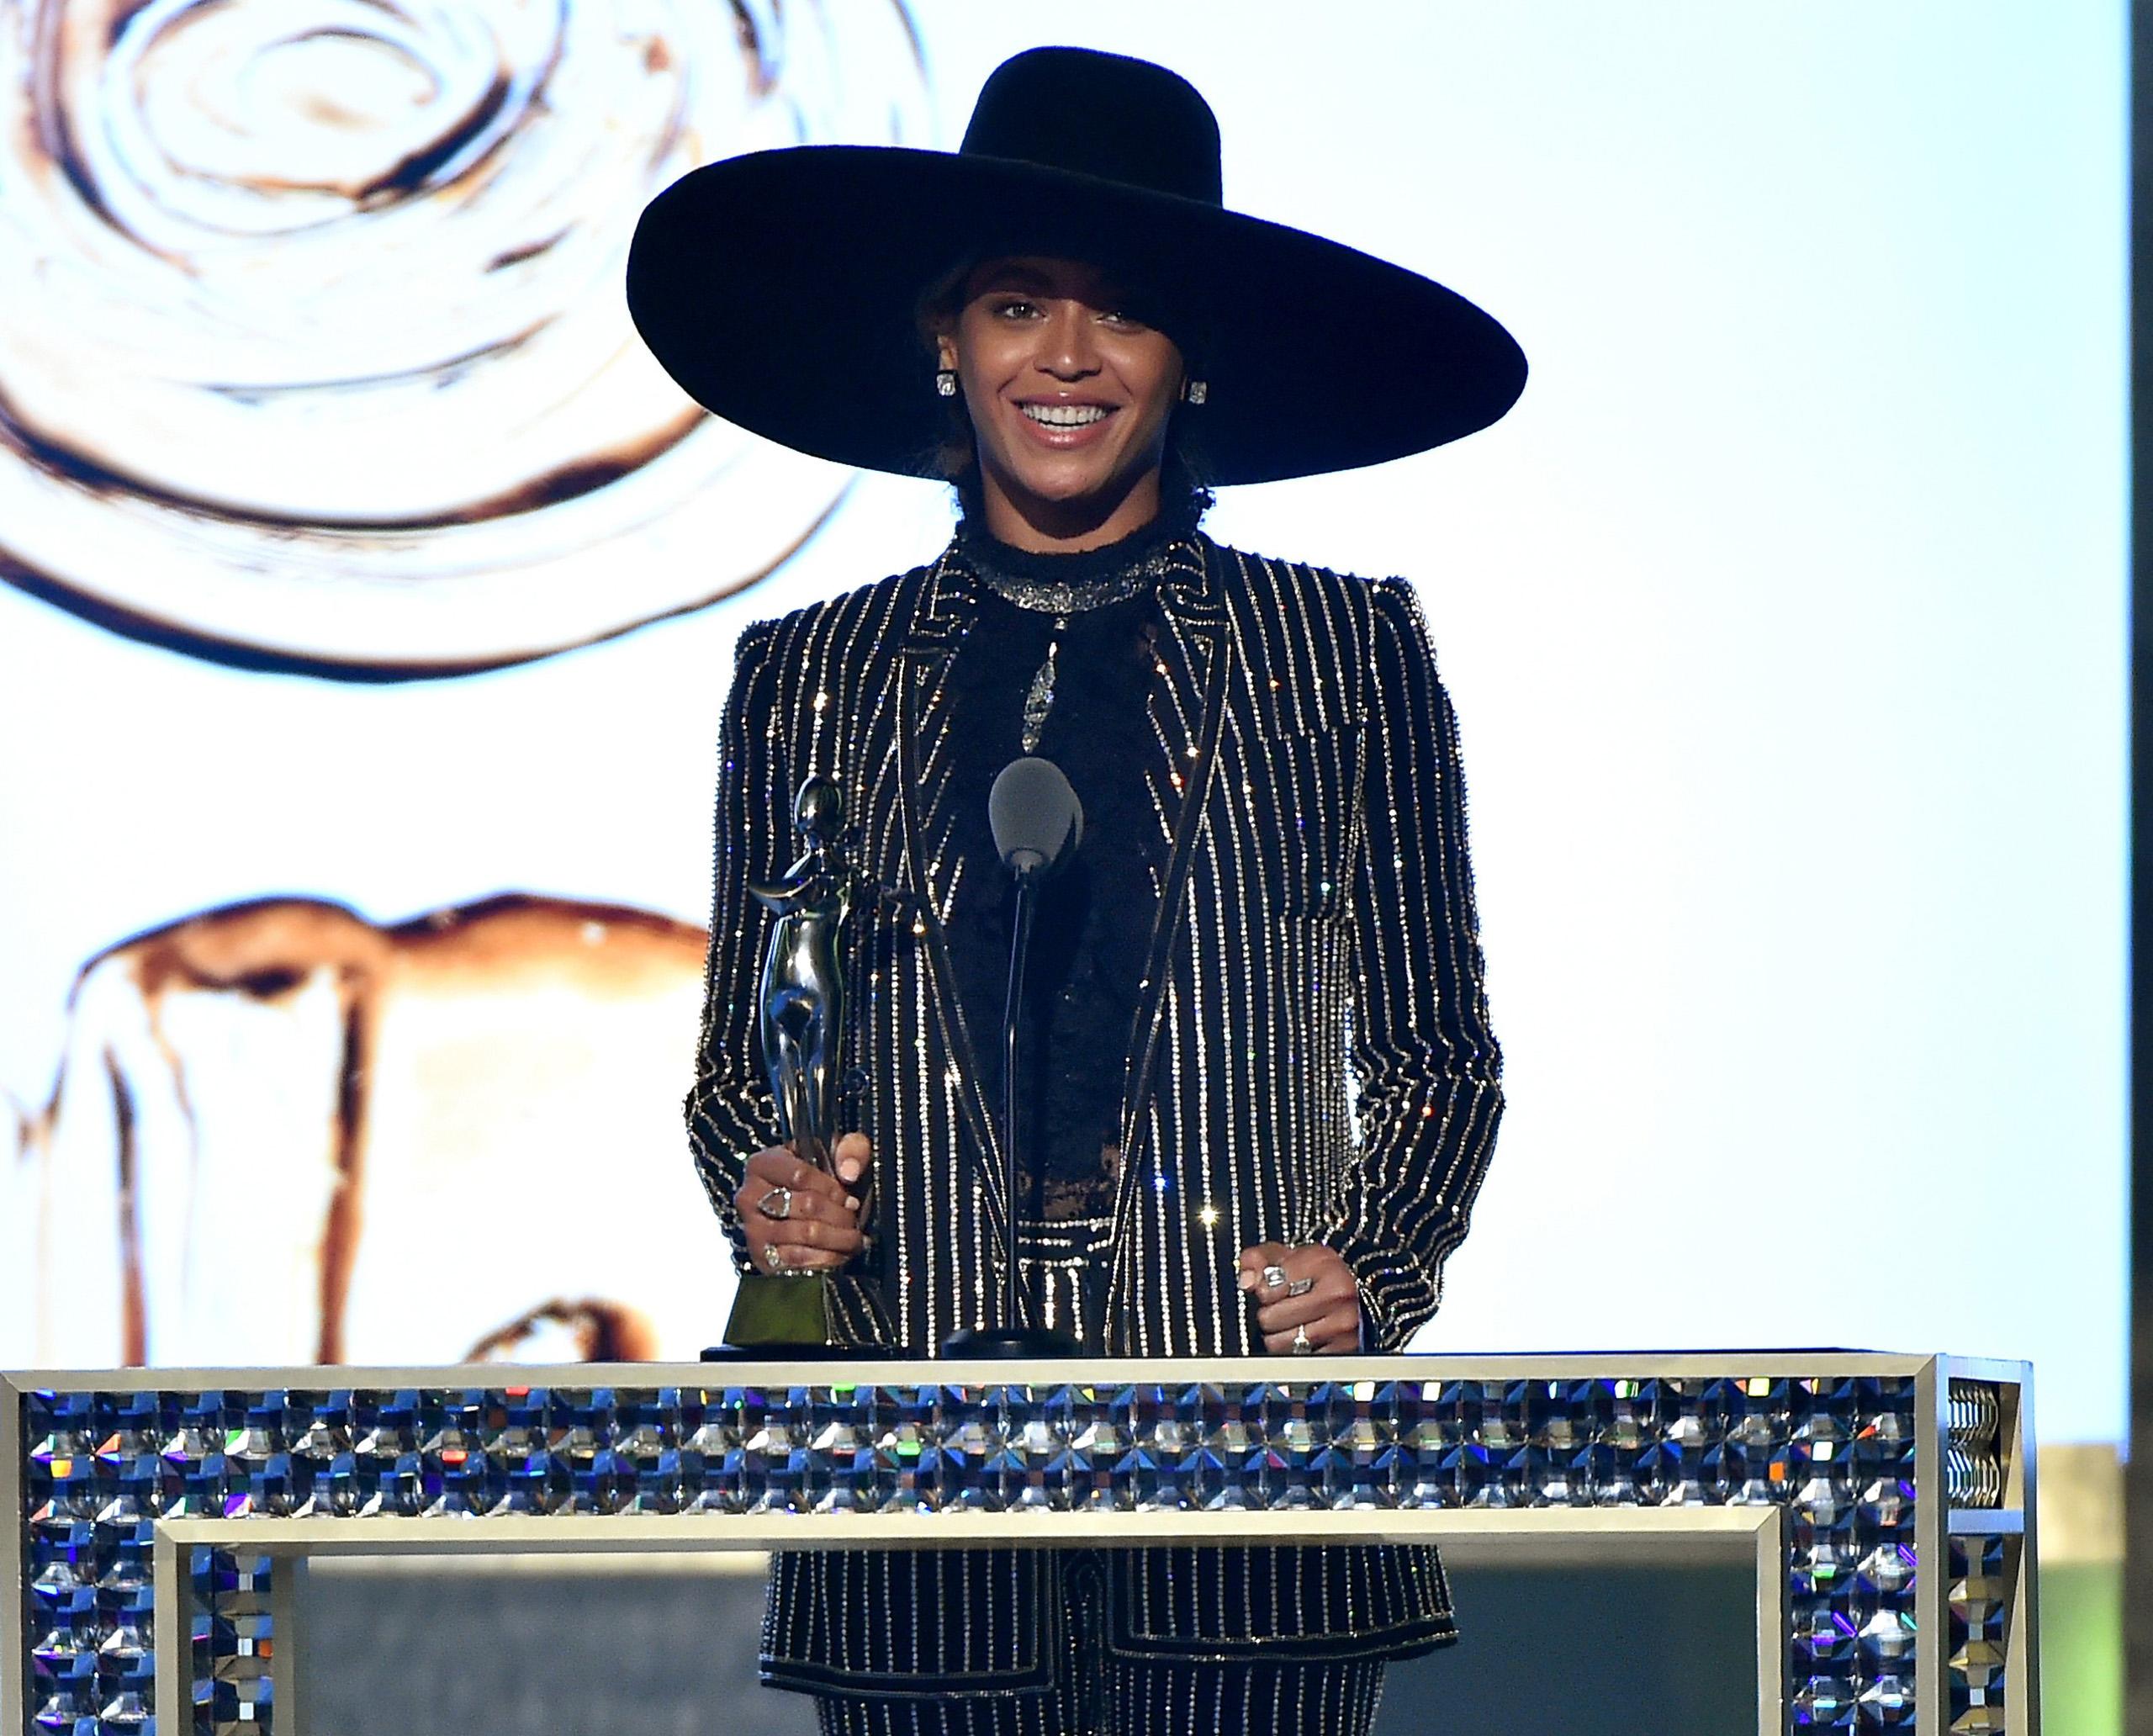 Beyonce accepts The CDFA Fashion Icon Award onstage at the 2016 CFDA Fashion Awards at the Hammerstein Ballroom in New York City, June 6, 2016.